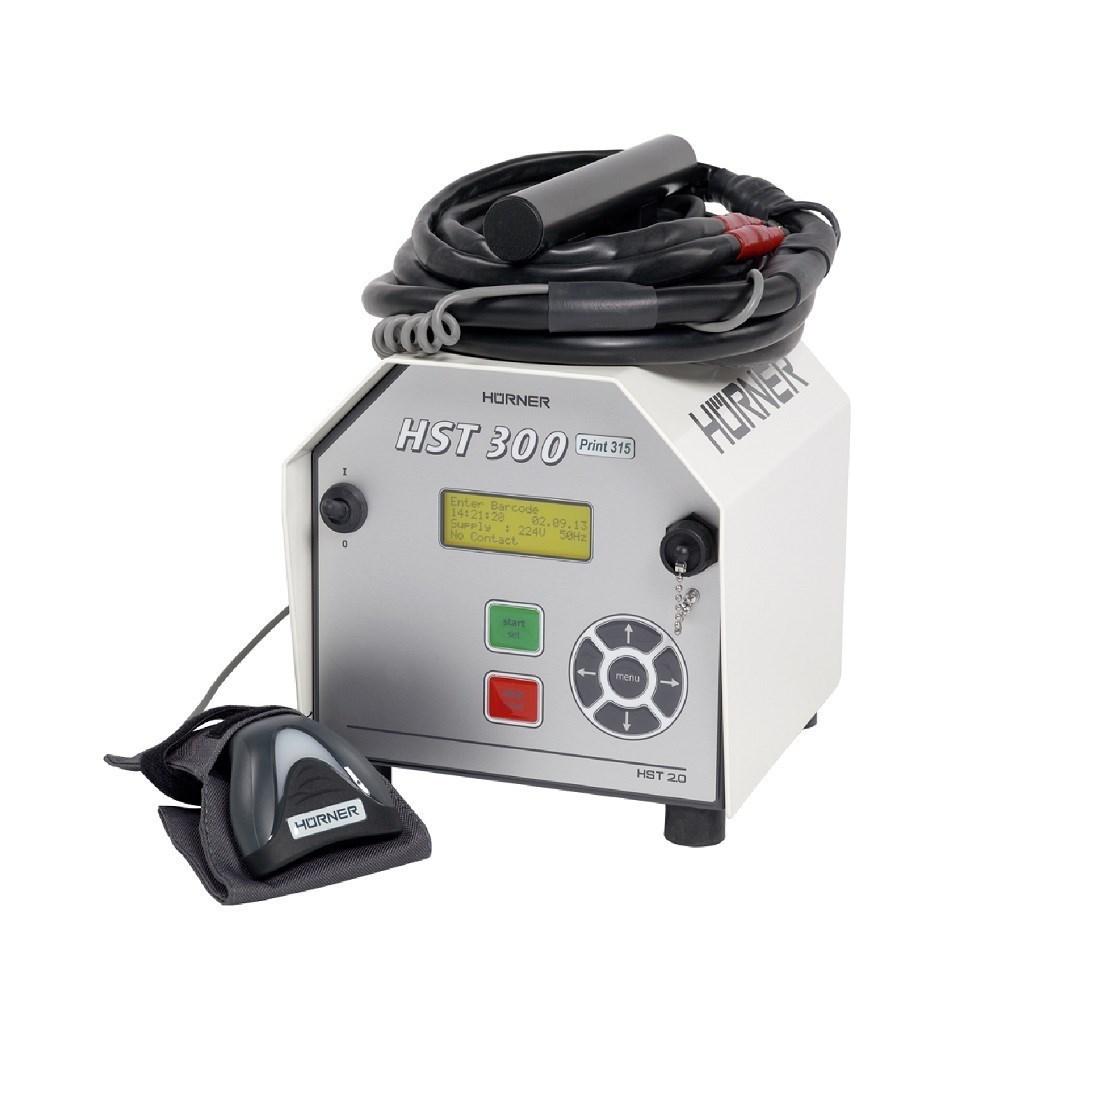 Hurner Elektrolastrafo HST300 315 2.0 print/usb 200-230-016